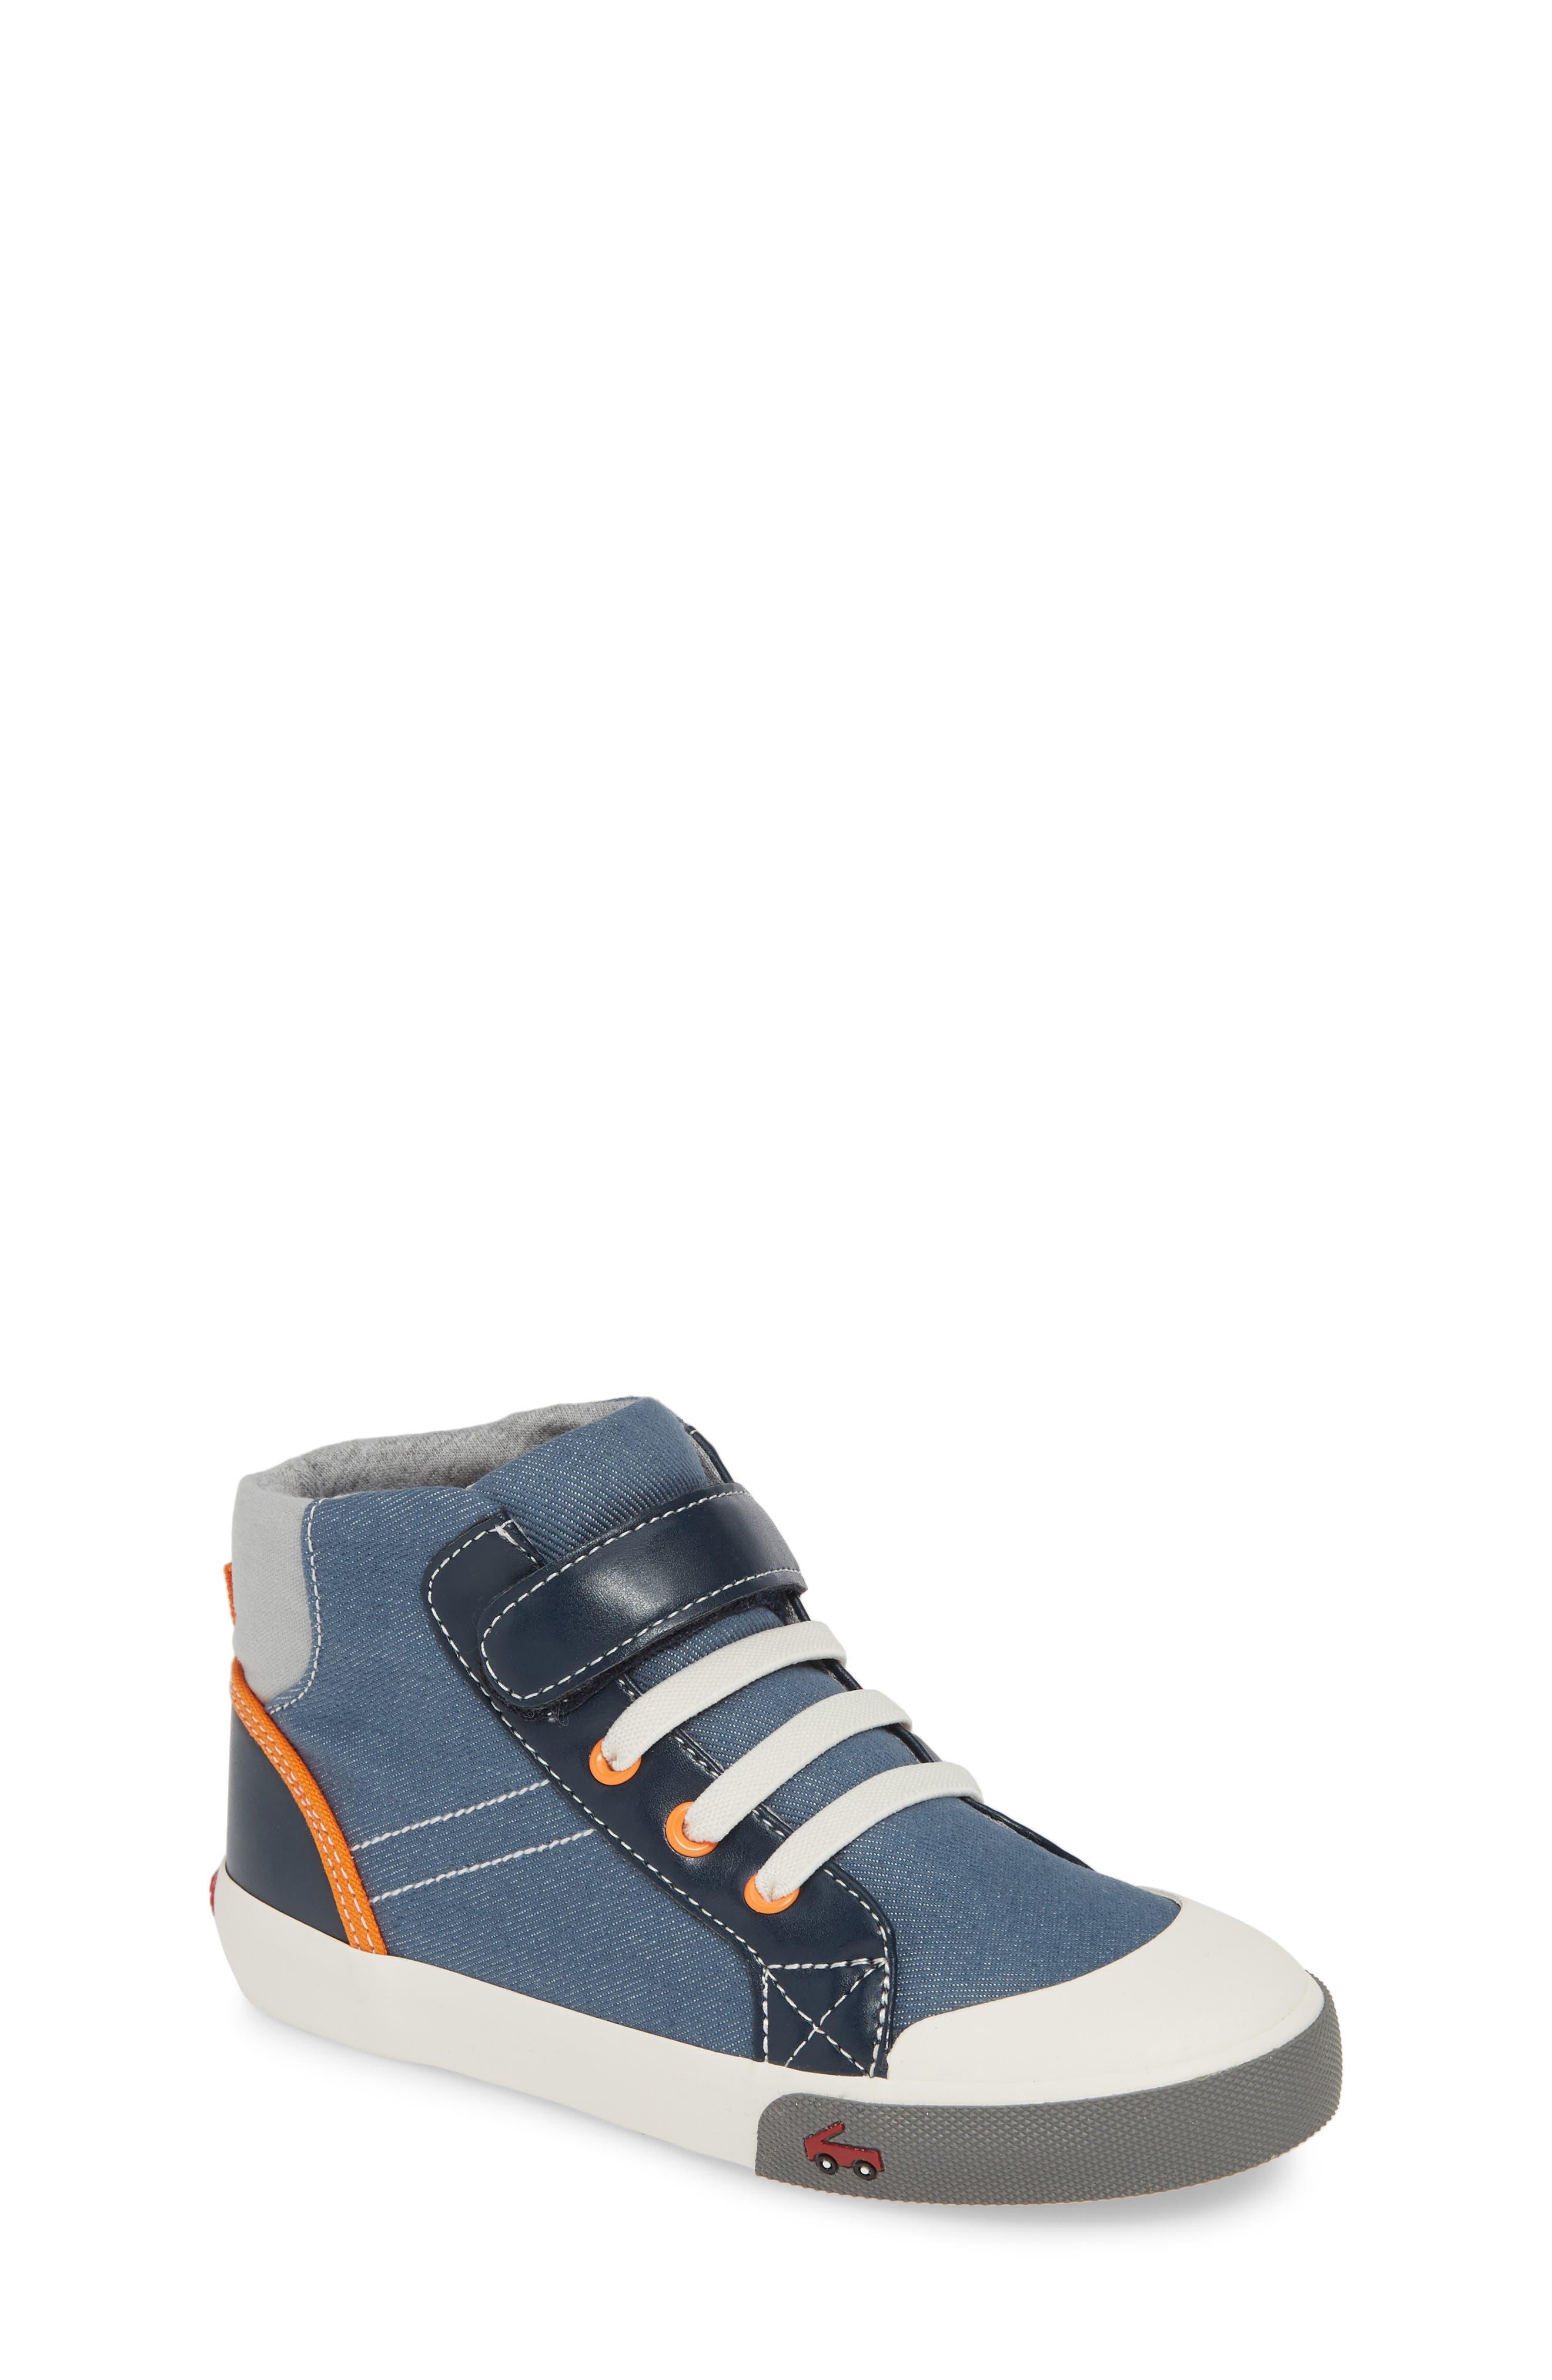 See Kai Run 'Dane' High Top Sneaker